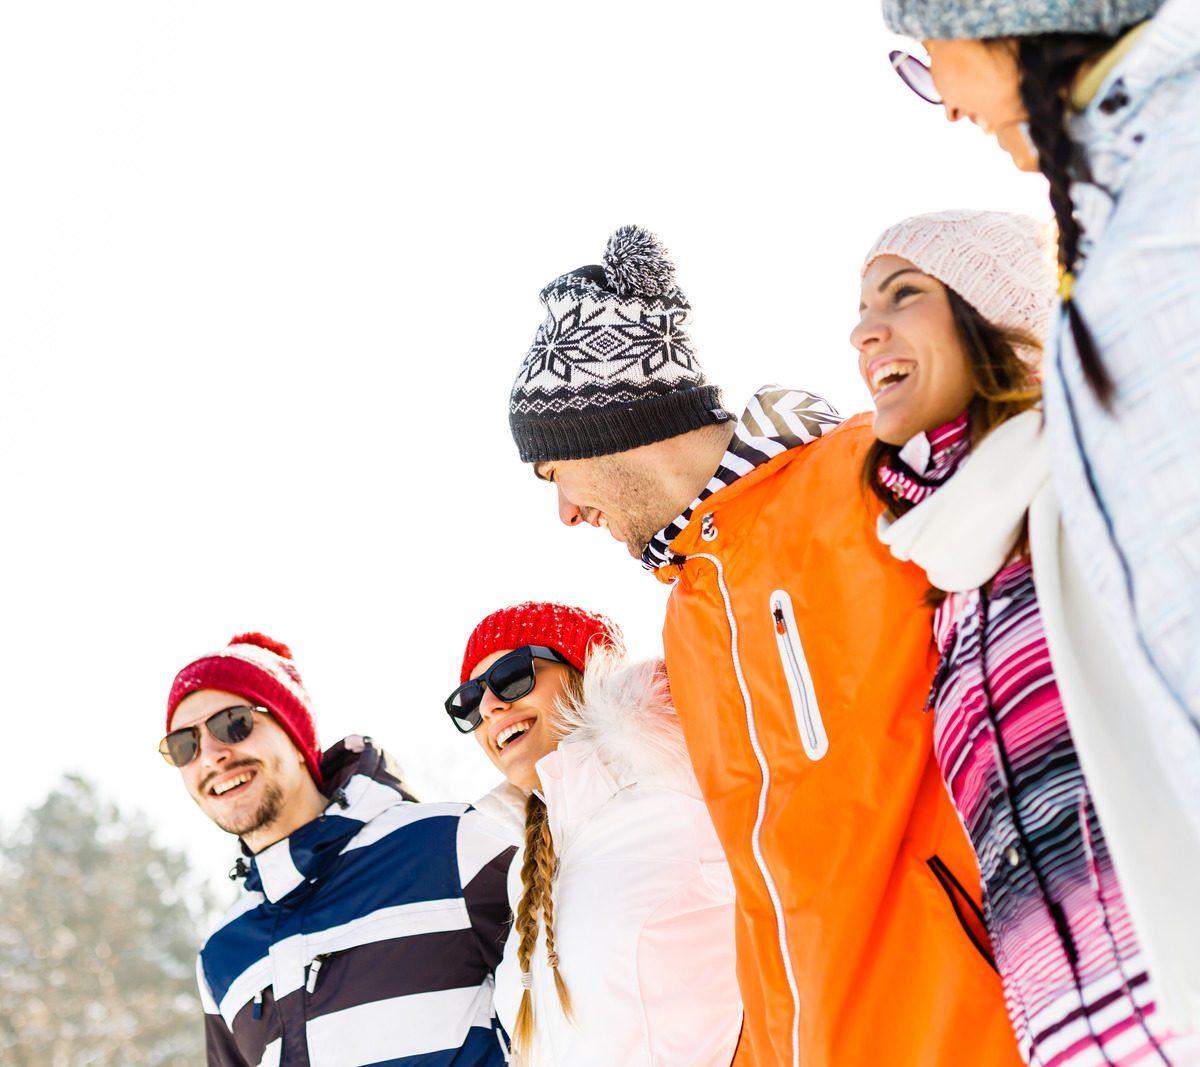 Friends enjoying winter holidays.